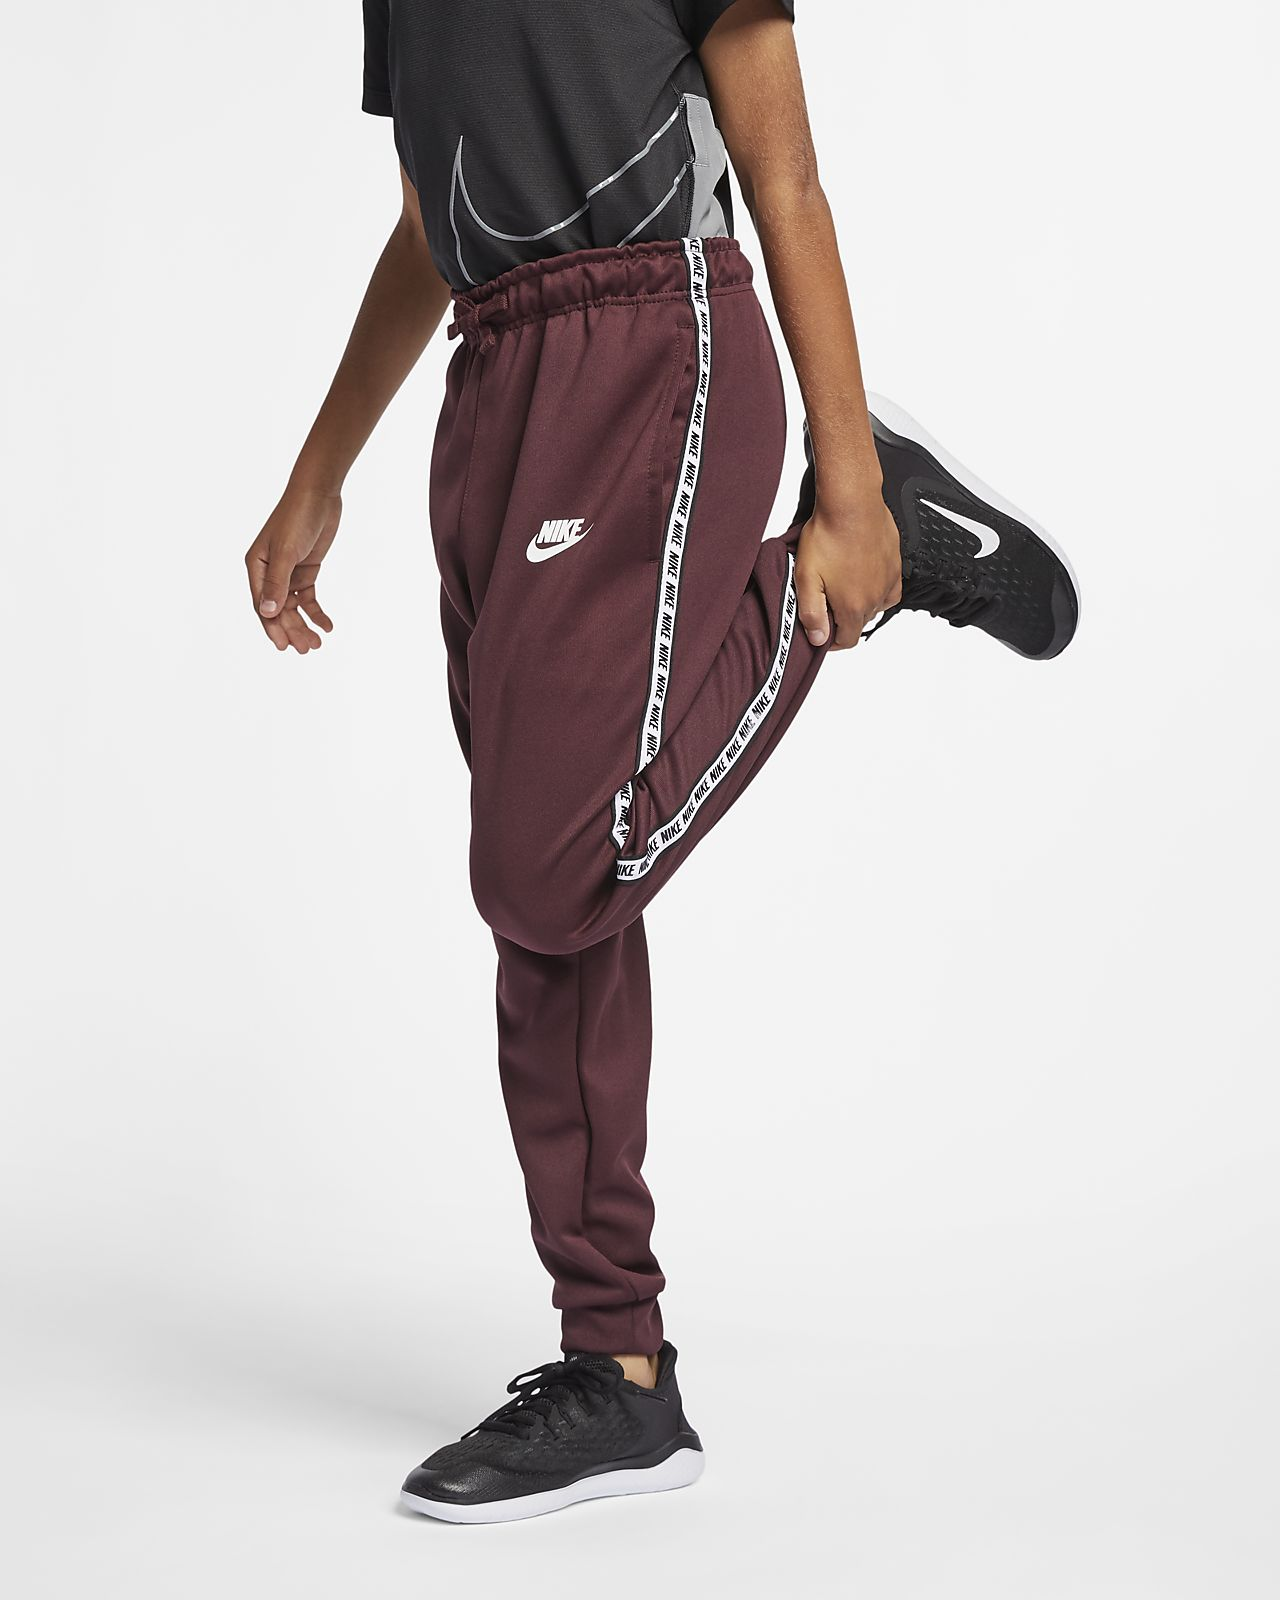 Relámpago Arte Presidente  pantalon nike sportswear off 50% - www.skolanlar.nu